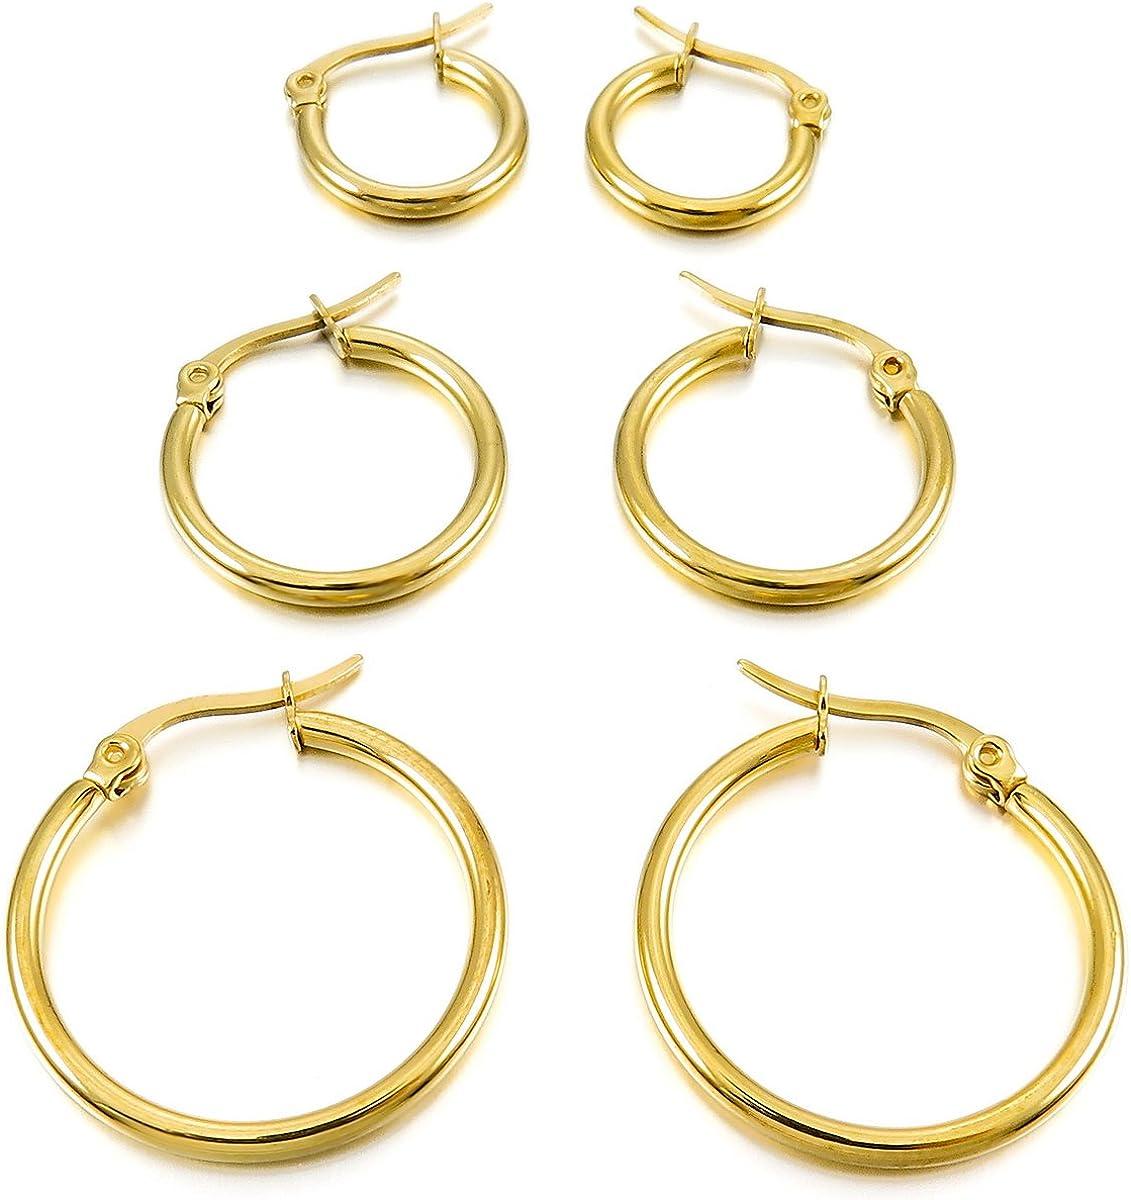 MunkiMix 15mm 20mm 25mm Acero Inoxidable Aro Hoop Huggie Pendientes Plata Oro Dorado Rosa Oro Negro Tono Conjunto Set (3 Coppiaes) Mujer